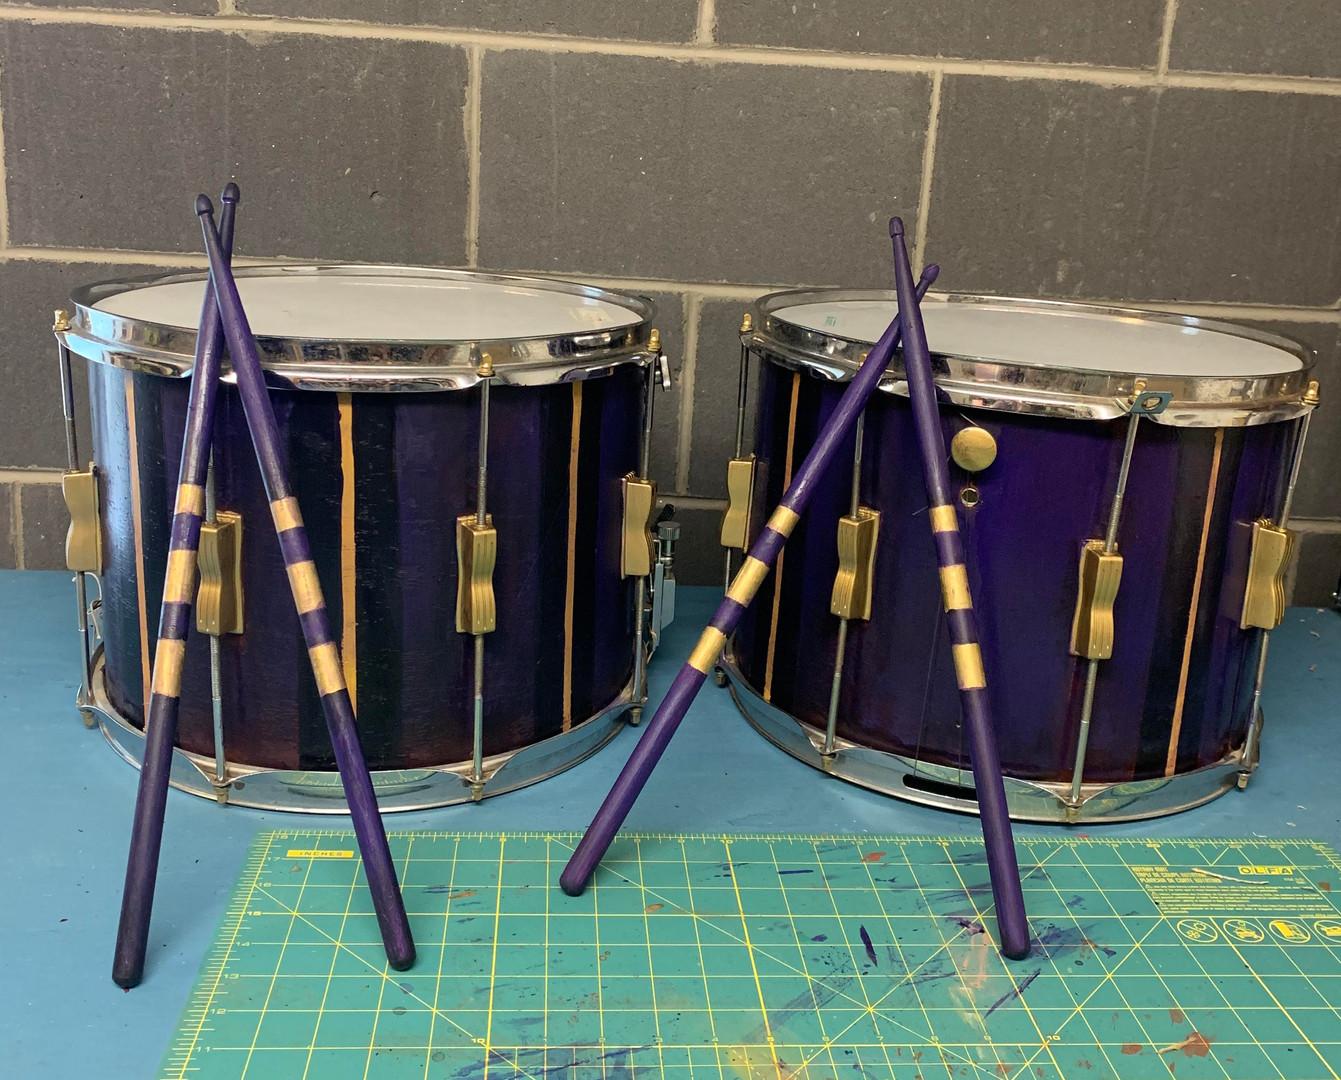 Town Crier Drums